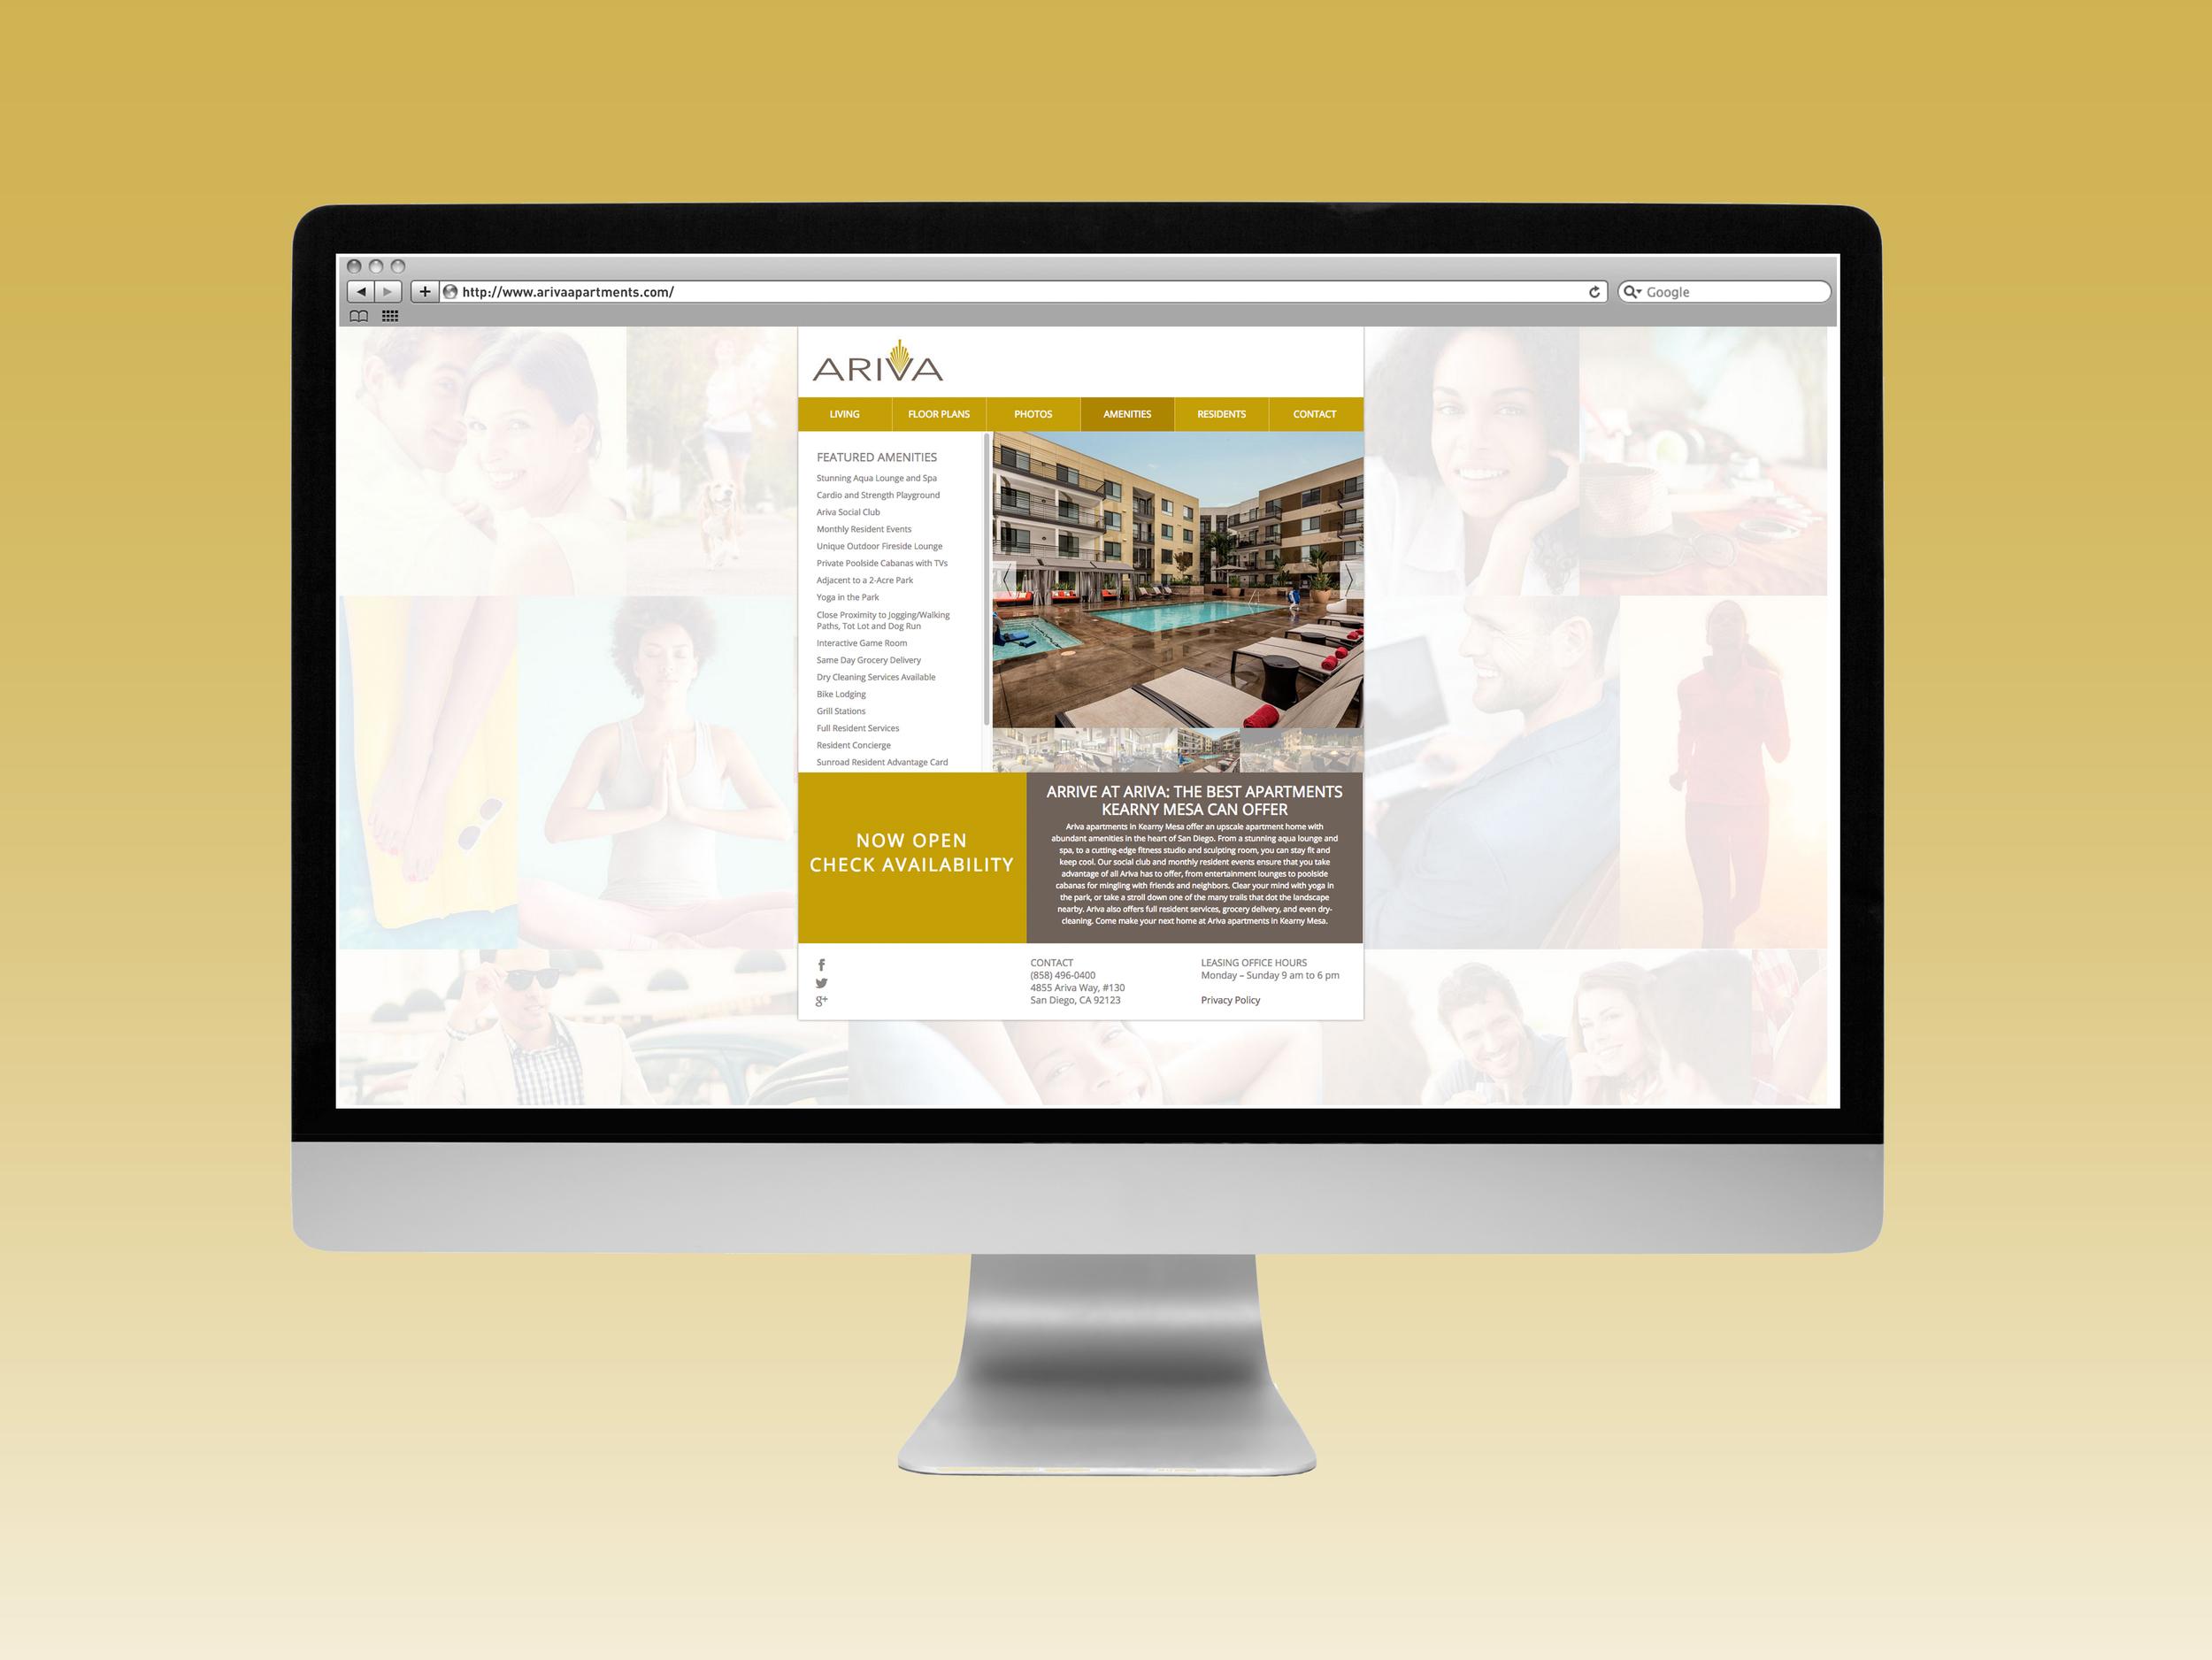 ARIVA_Website_web1 Amenities.jpg